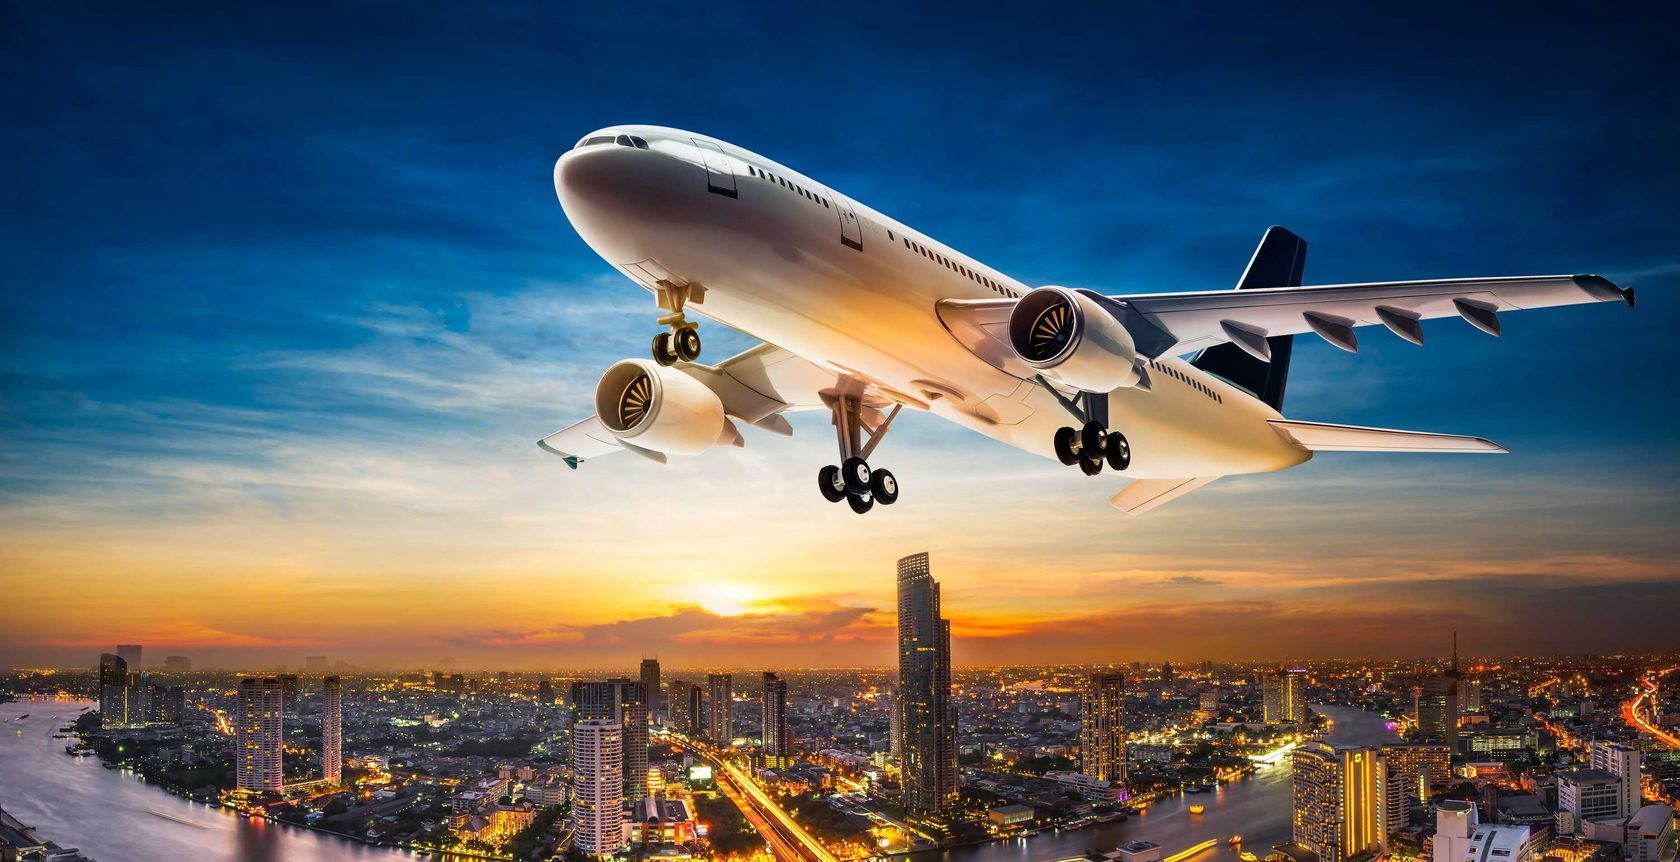 самолет летит на фоне города фото текирова место, где